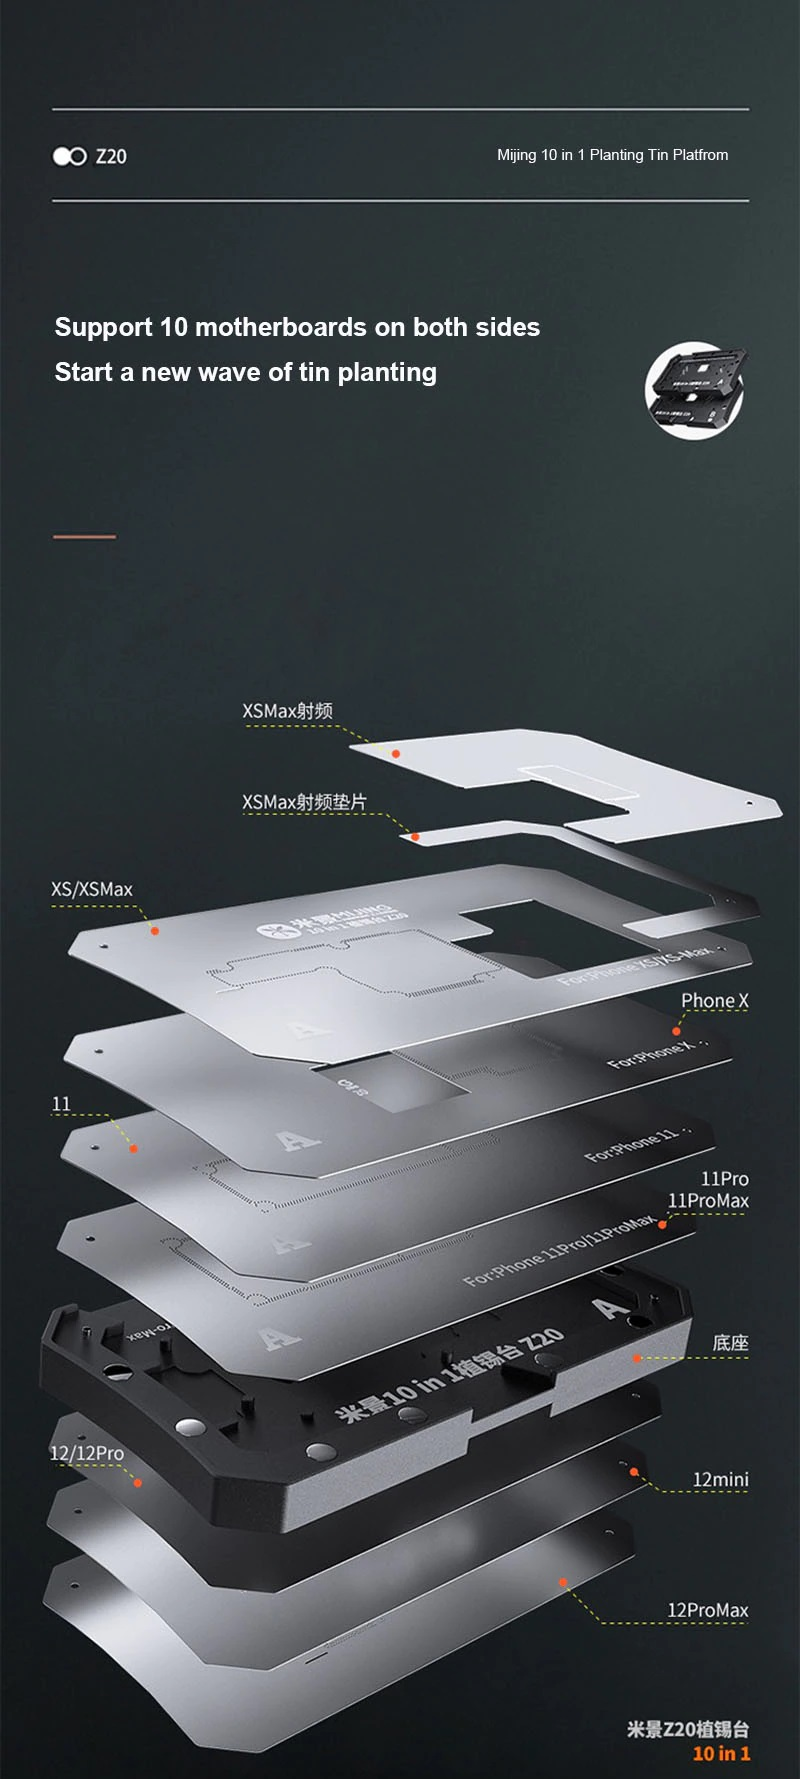 MIJING Z20 Kit de fixação / suporte para reballagem BGA com estênceis para iPhone X / XS / XS Max / 11 / 11Pro / 11 Pro Max / 12 / 12mini / 12Pro / 12ProMax